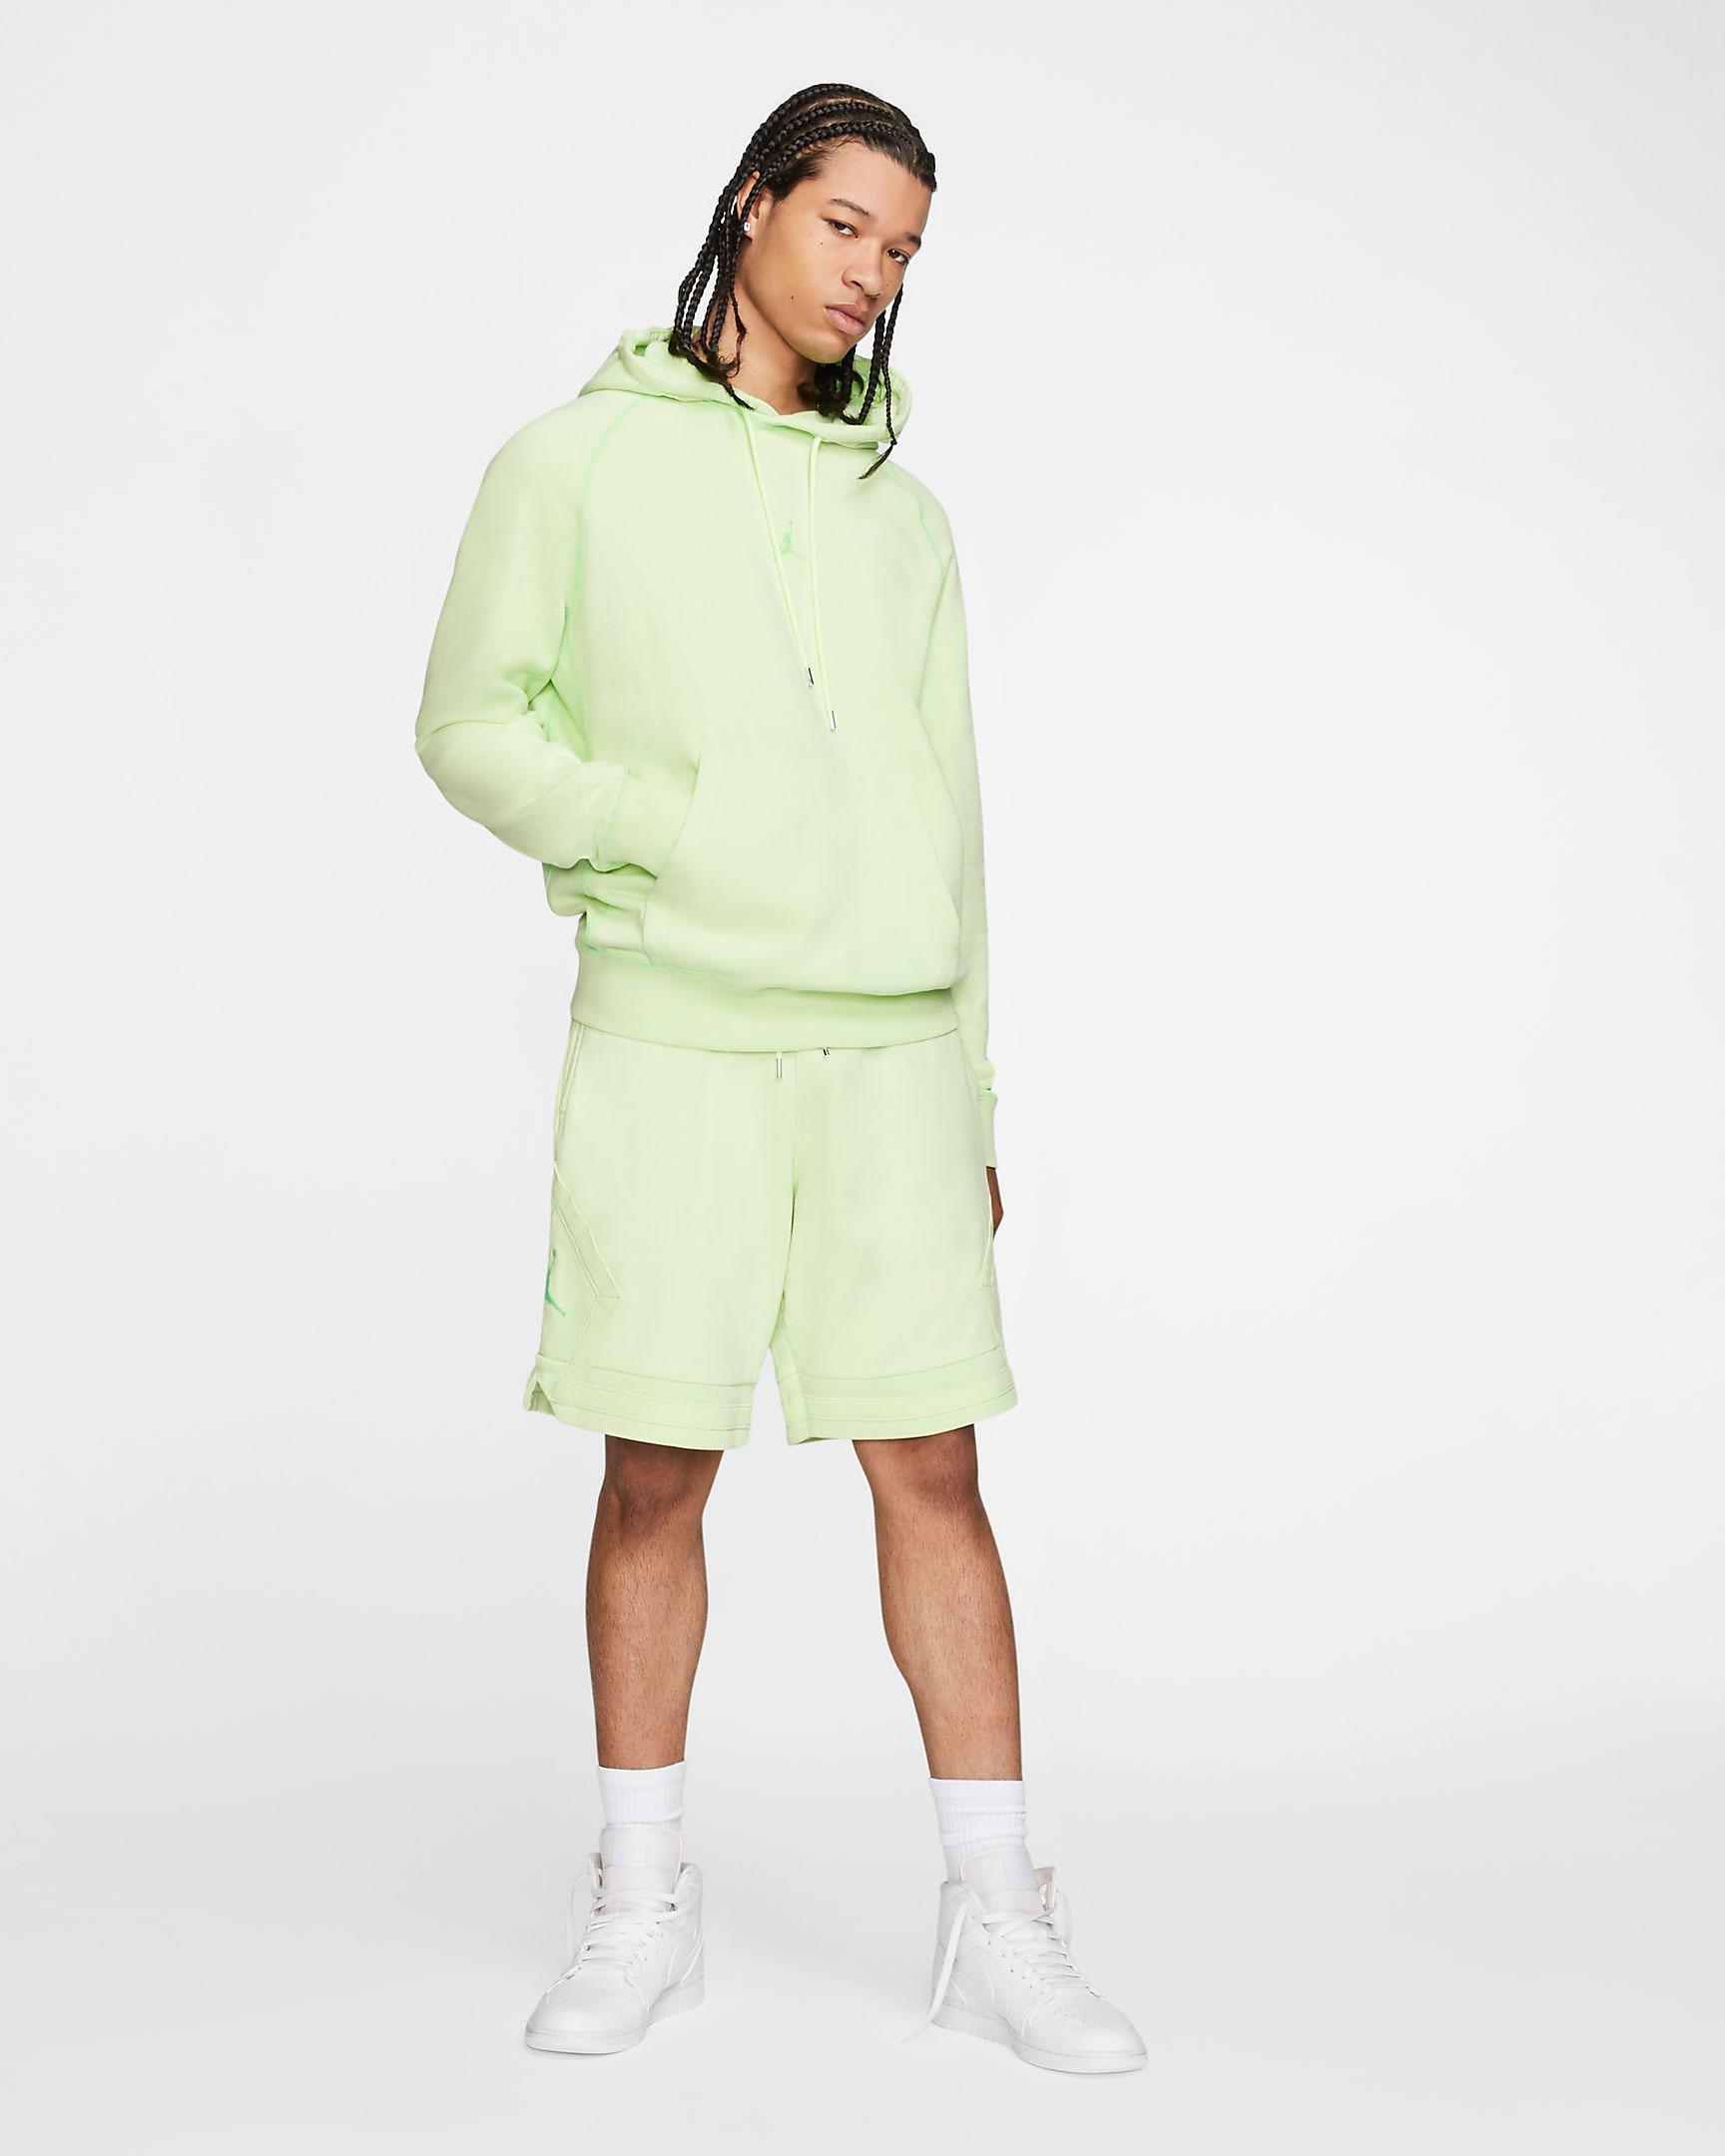 jordan-wings-washed-green-clothing